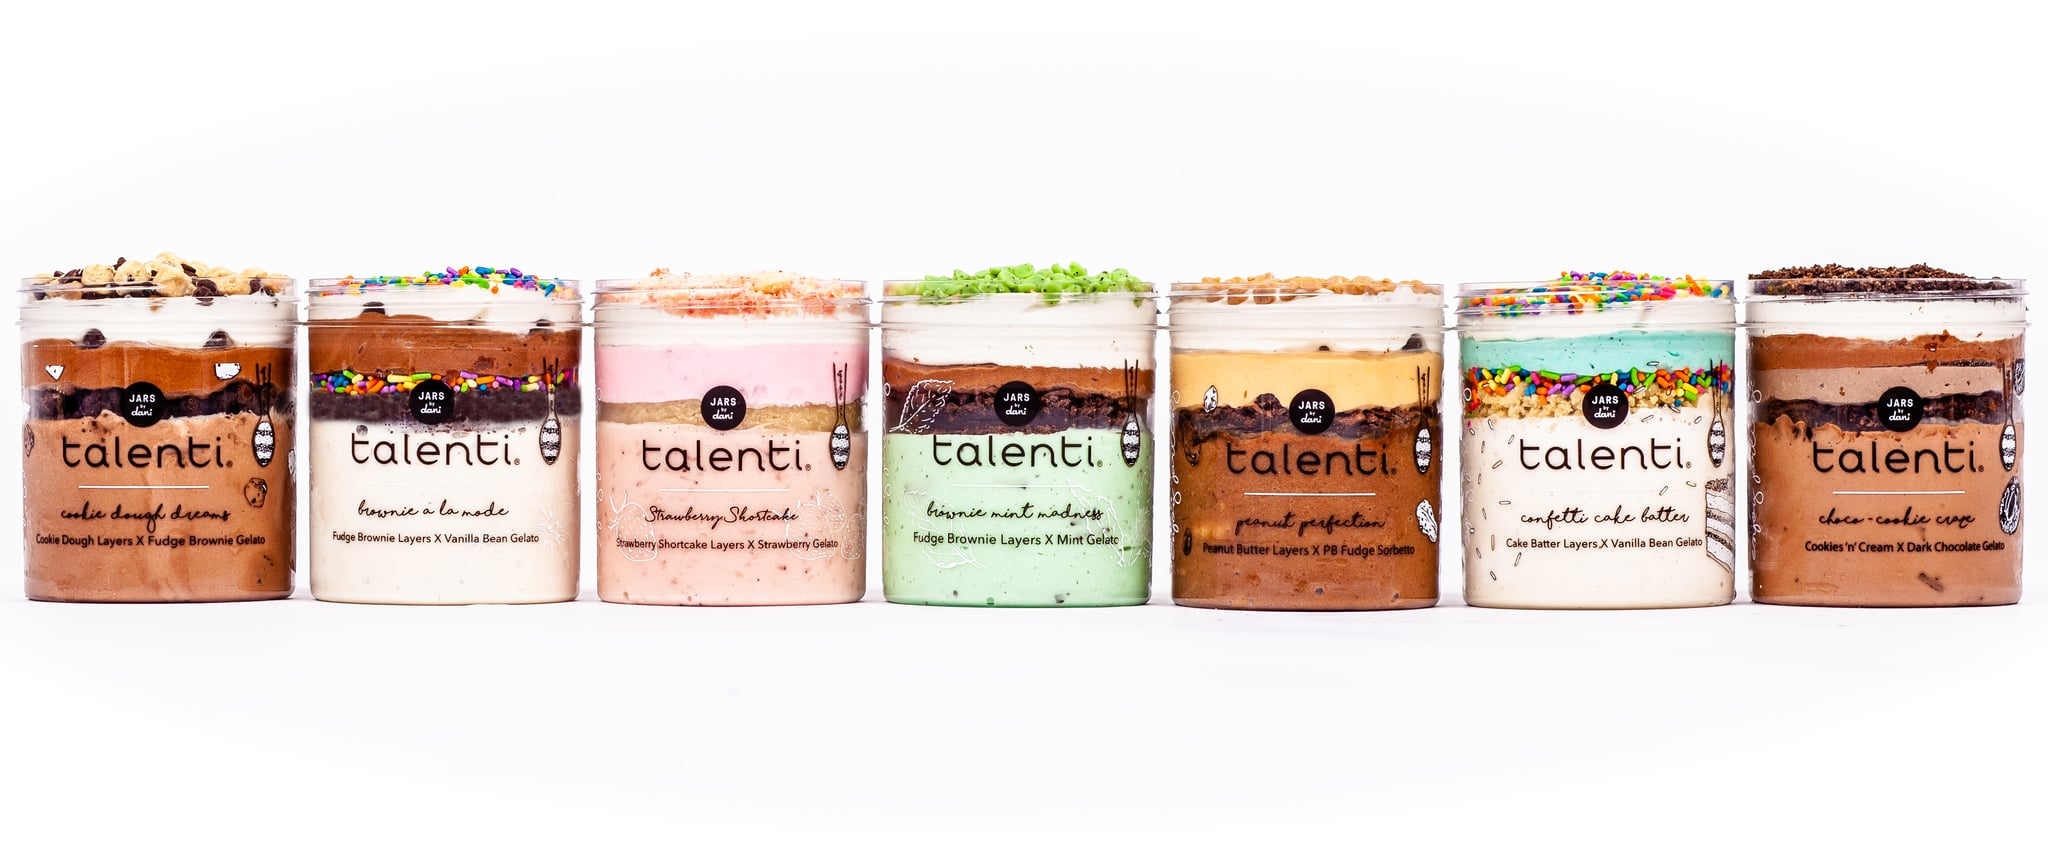 Talenti Jars by Dani Layered Gelato Flavors